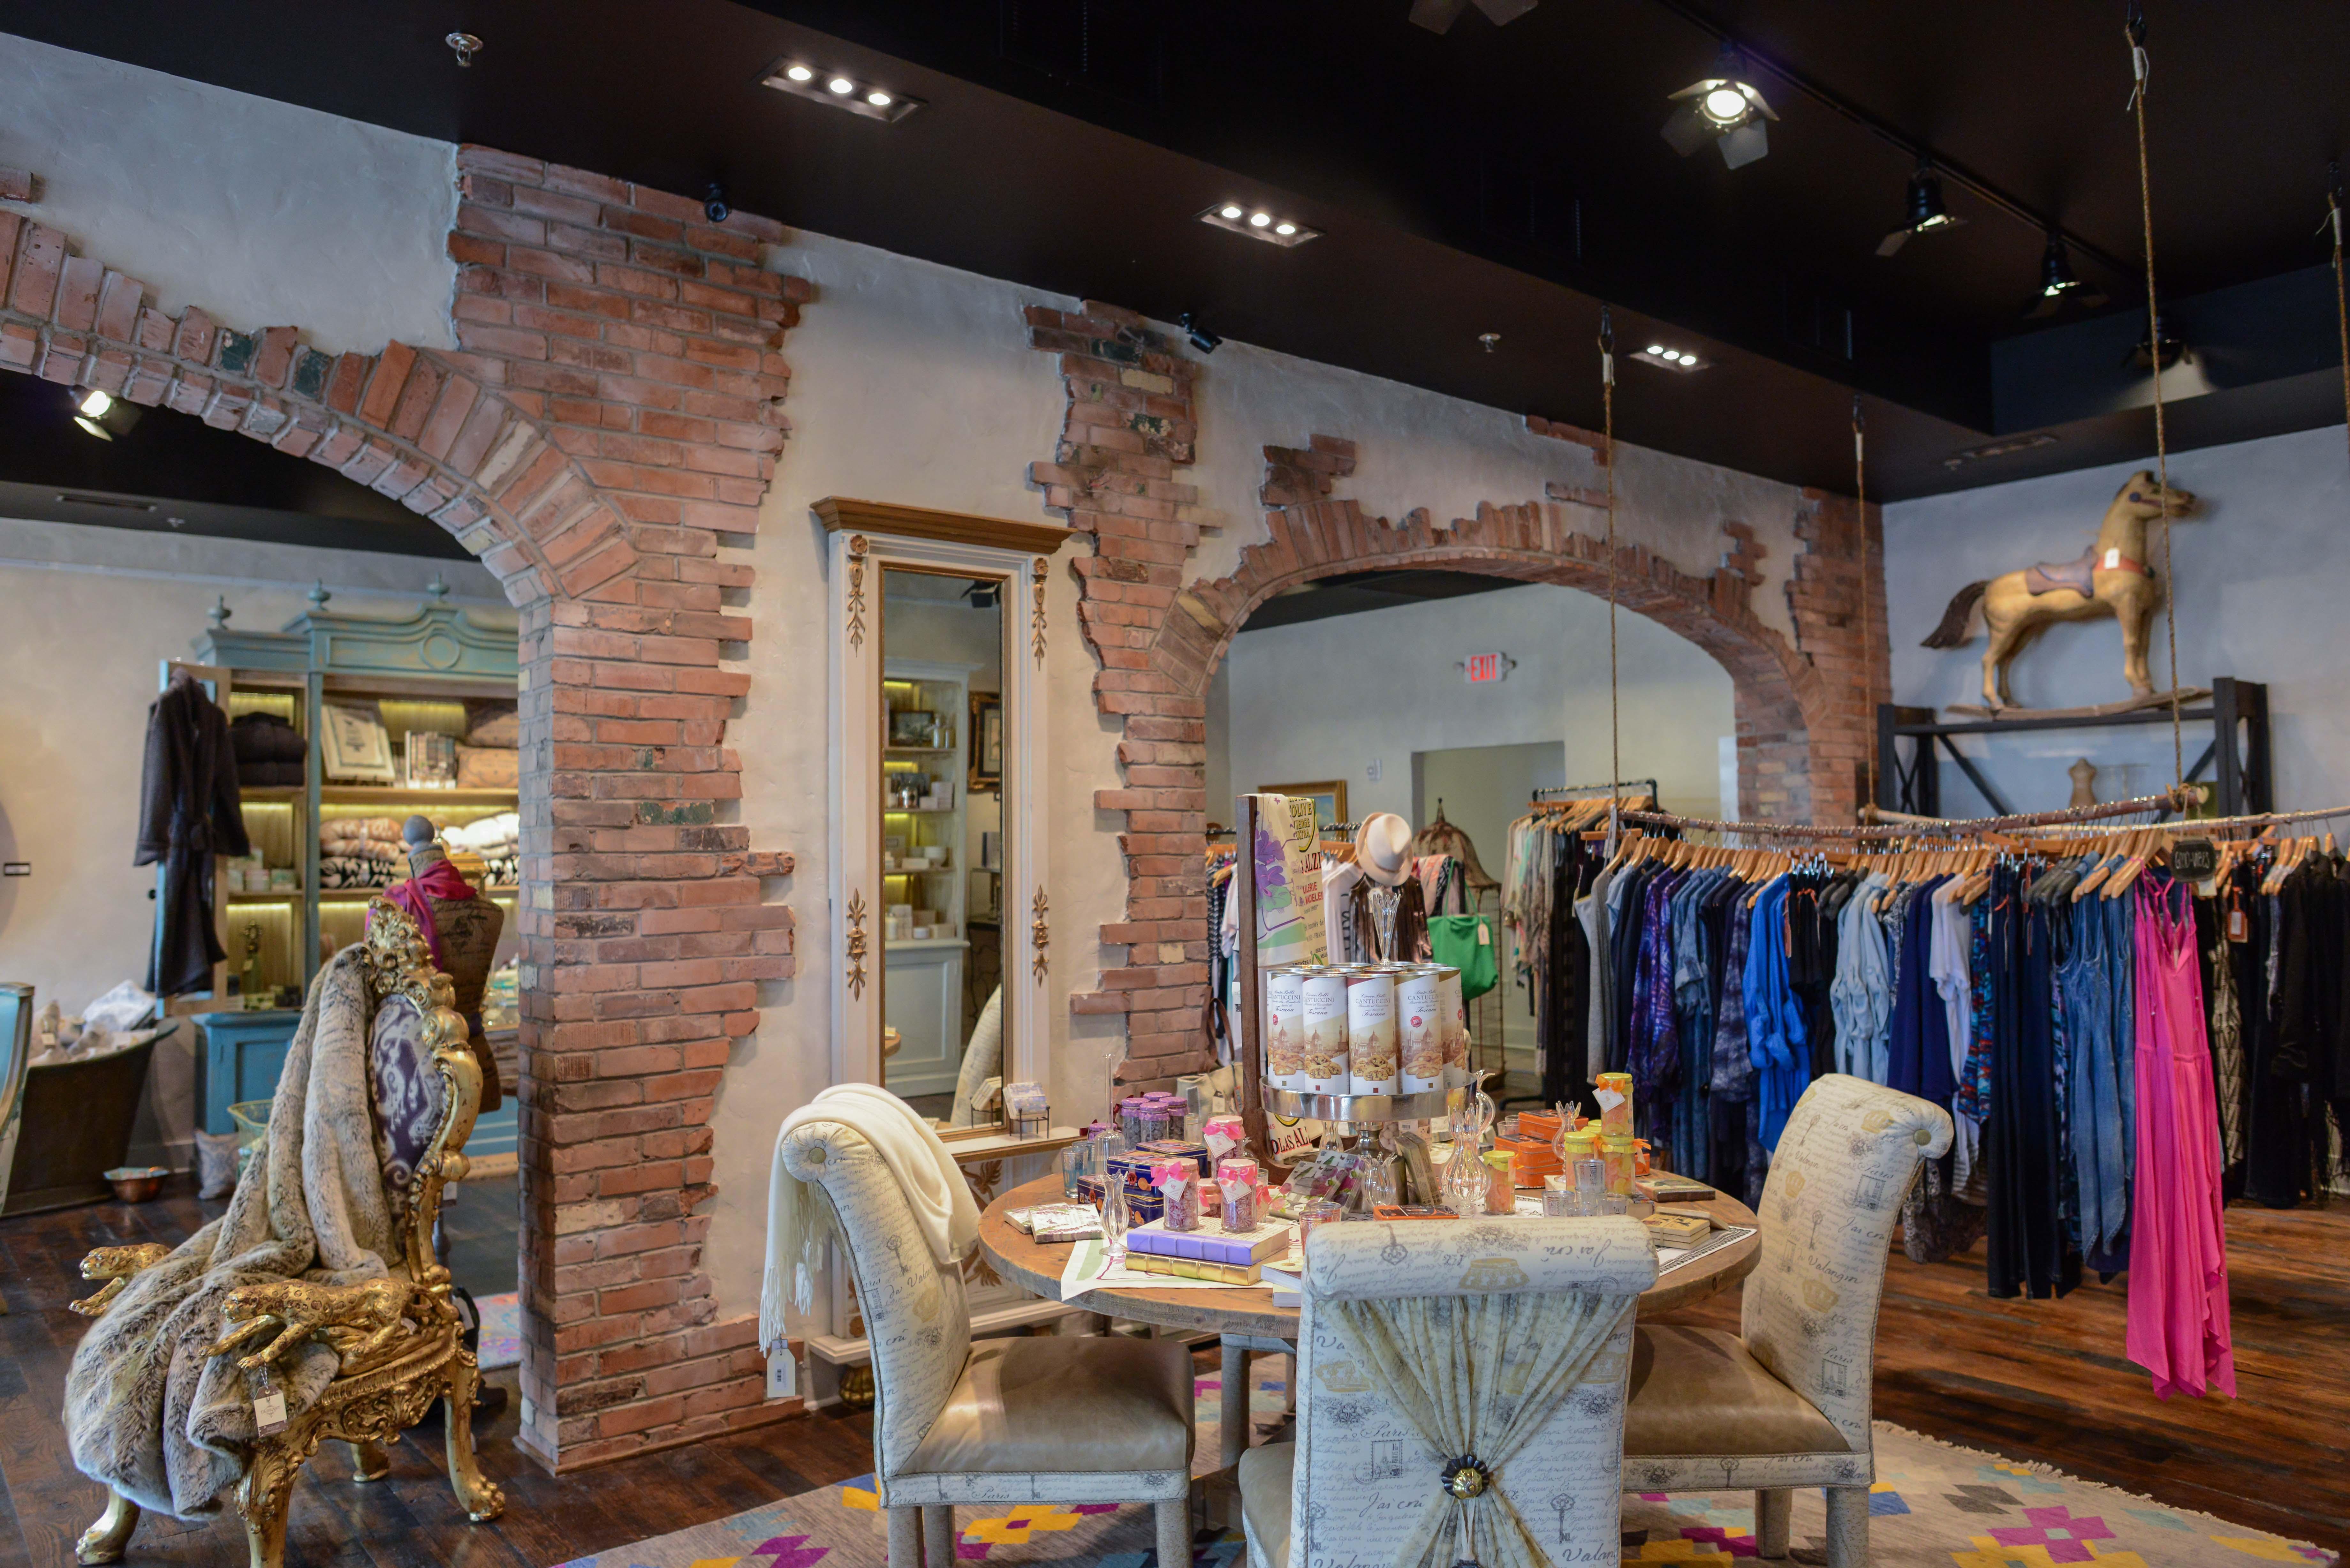 Dsirant footer2 local flavor avl visit explore shop asheville